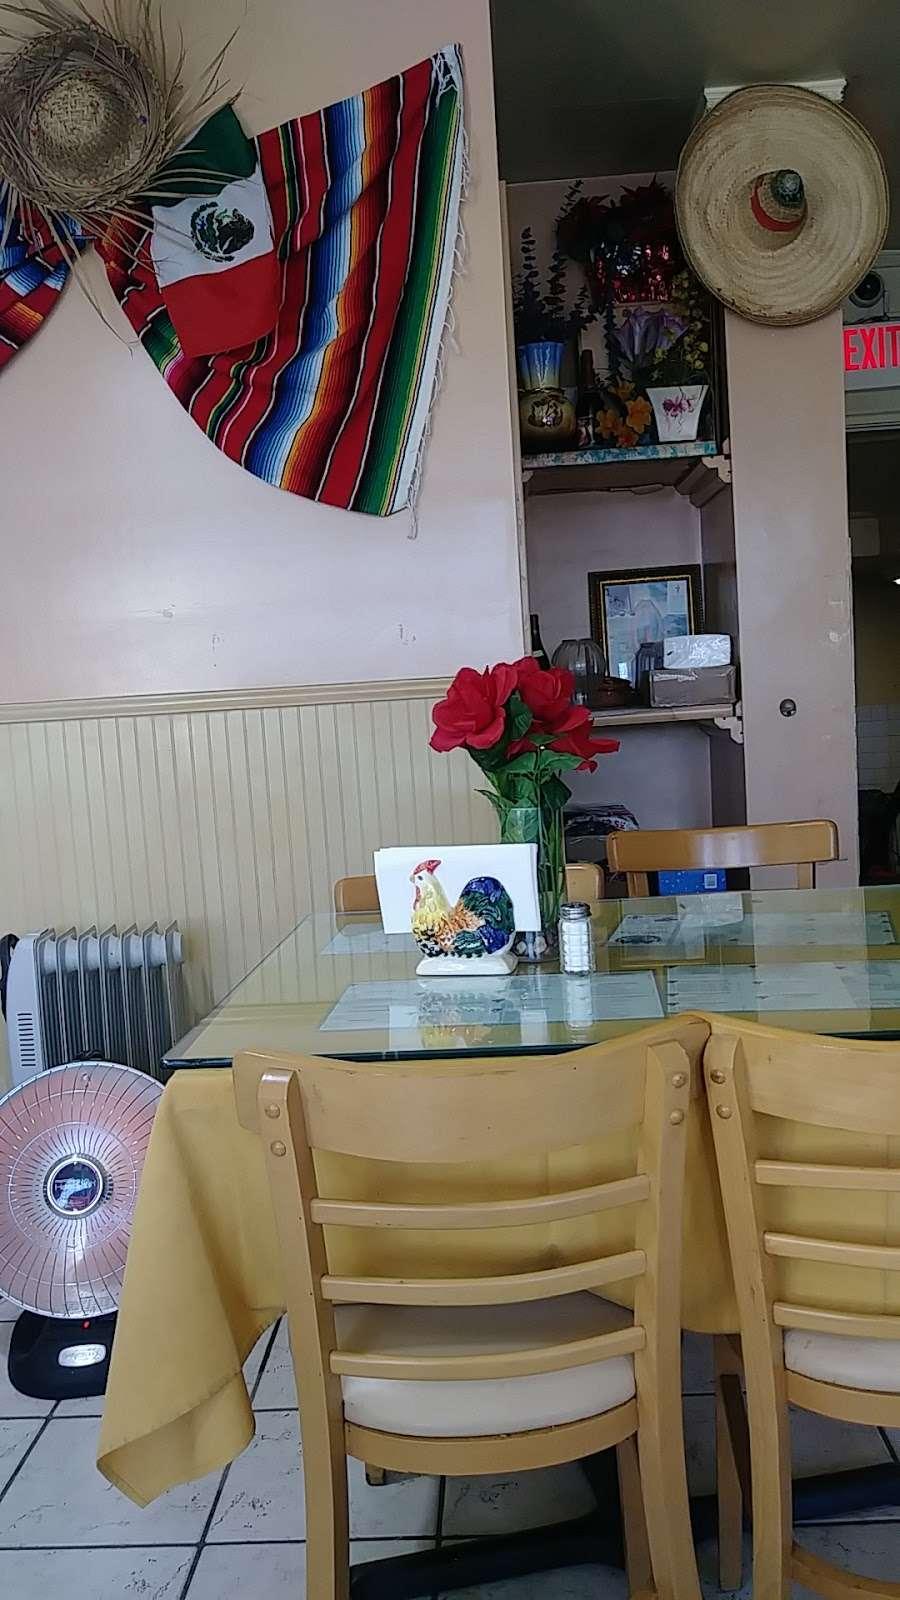 Vista Hermosa - restaurant    Photo 1 of 10   Address: 35 Ridgefield Ave, Ridgefield Park, NJ 07660, USA   Phone: (201) 373-9463